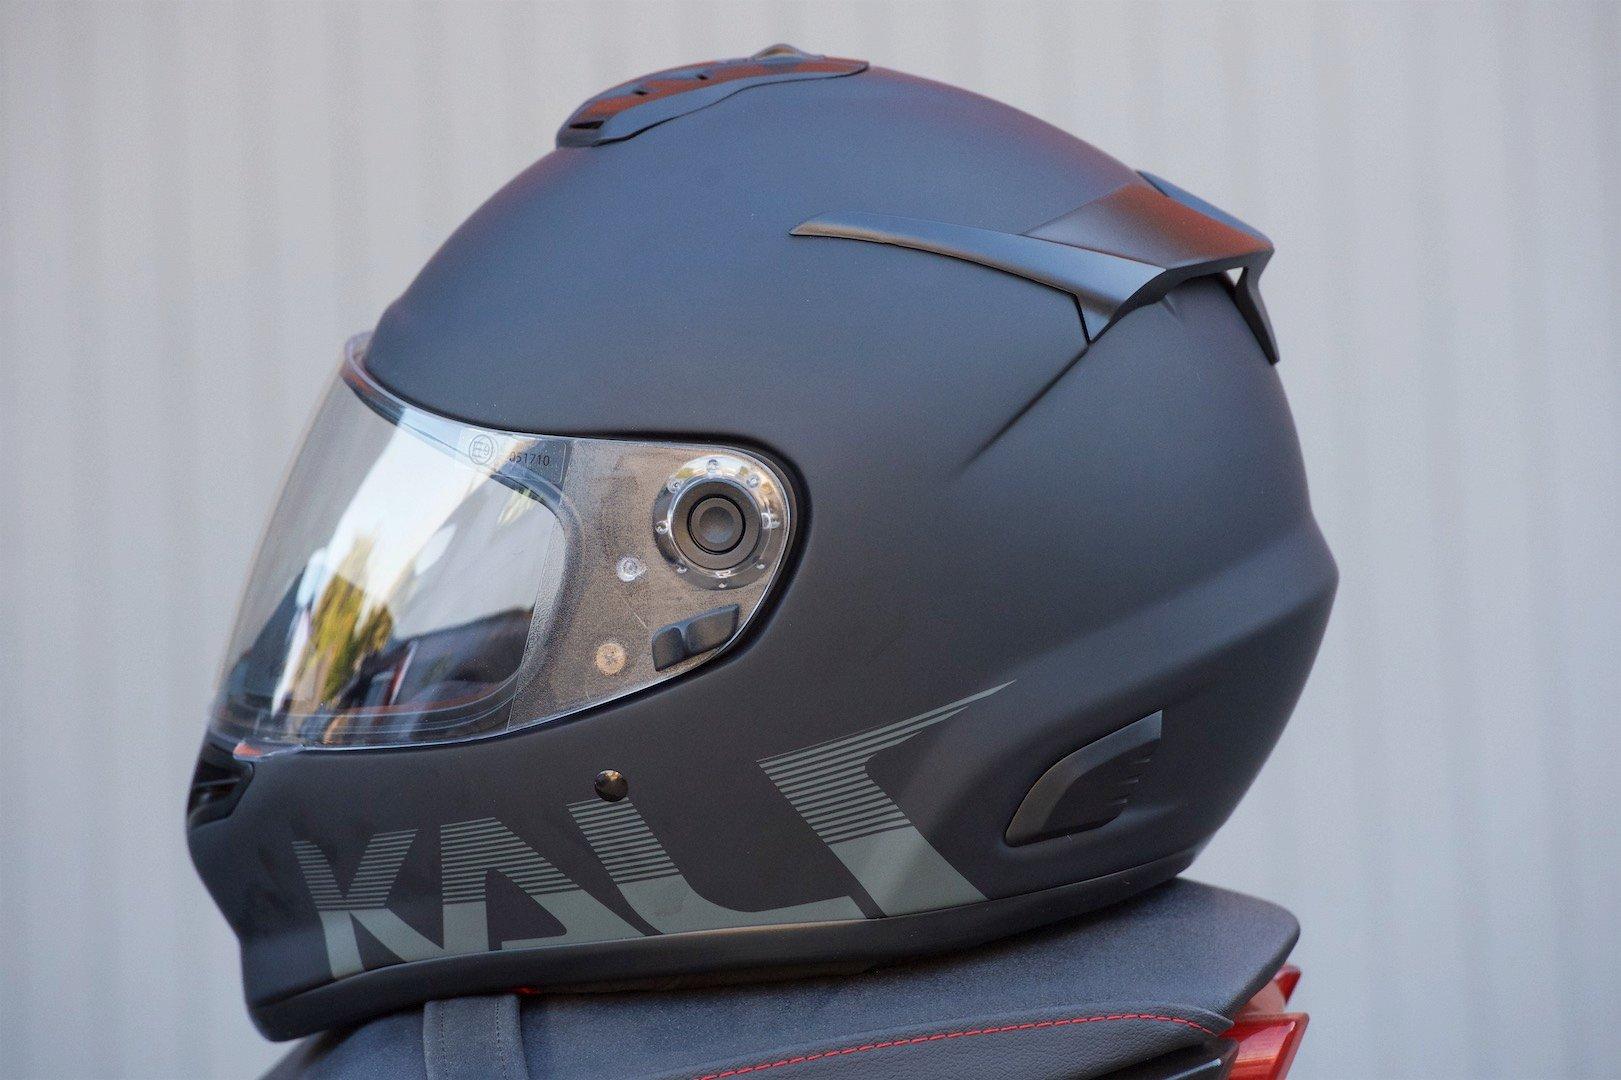 Kali Catalyst Motorcycle Helmet price